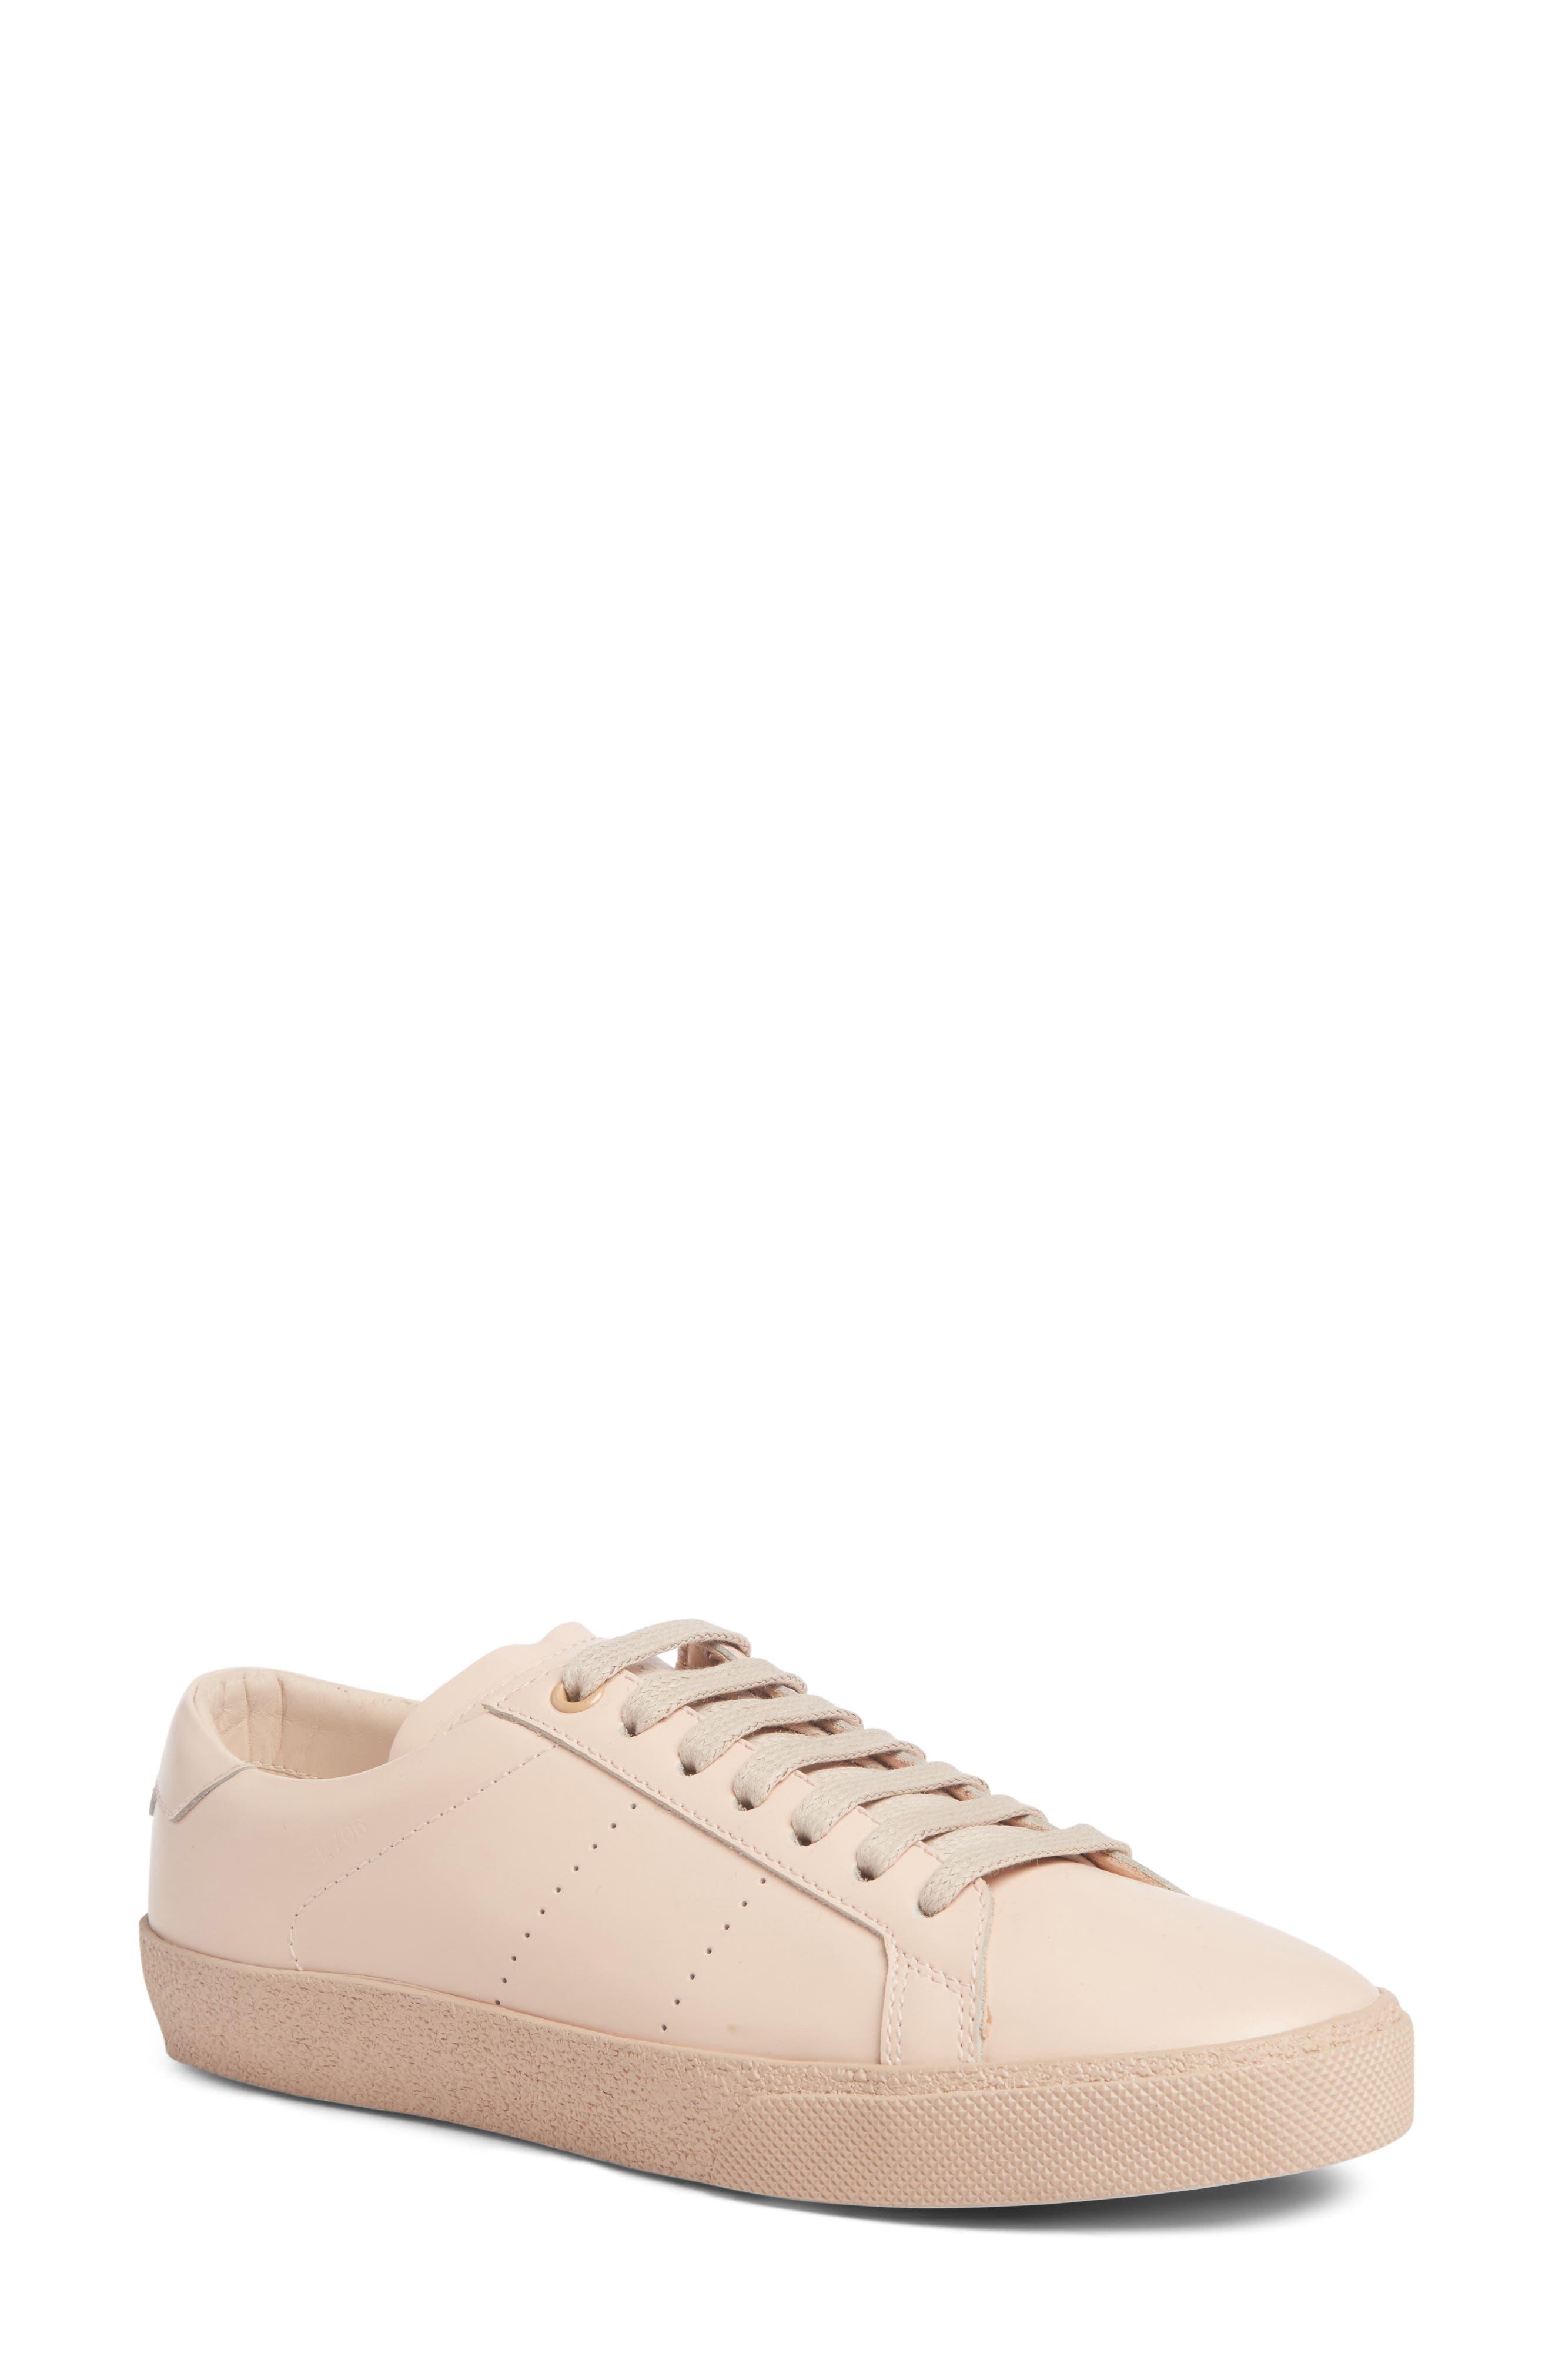 Main Image - Saint Laurent Court Classic Sneaker (Women)